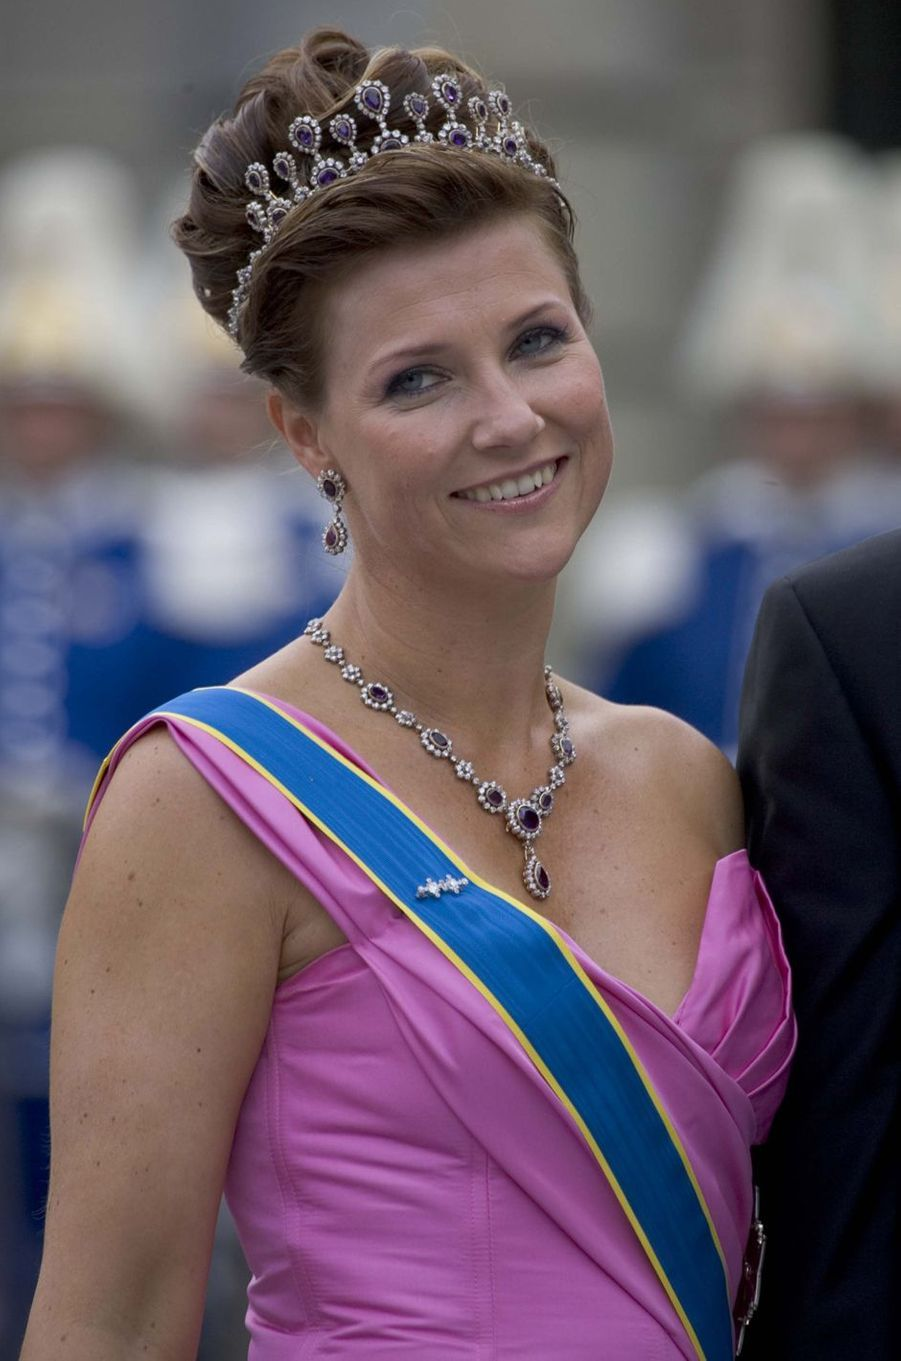 La princesse Märtha Louise de Norvège, le 19 juin 2010